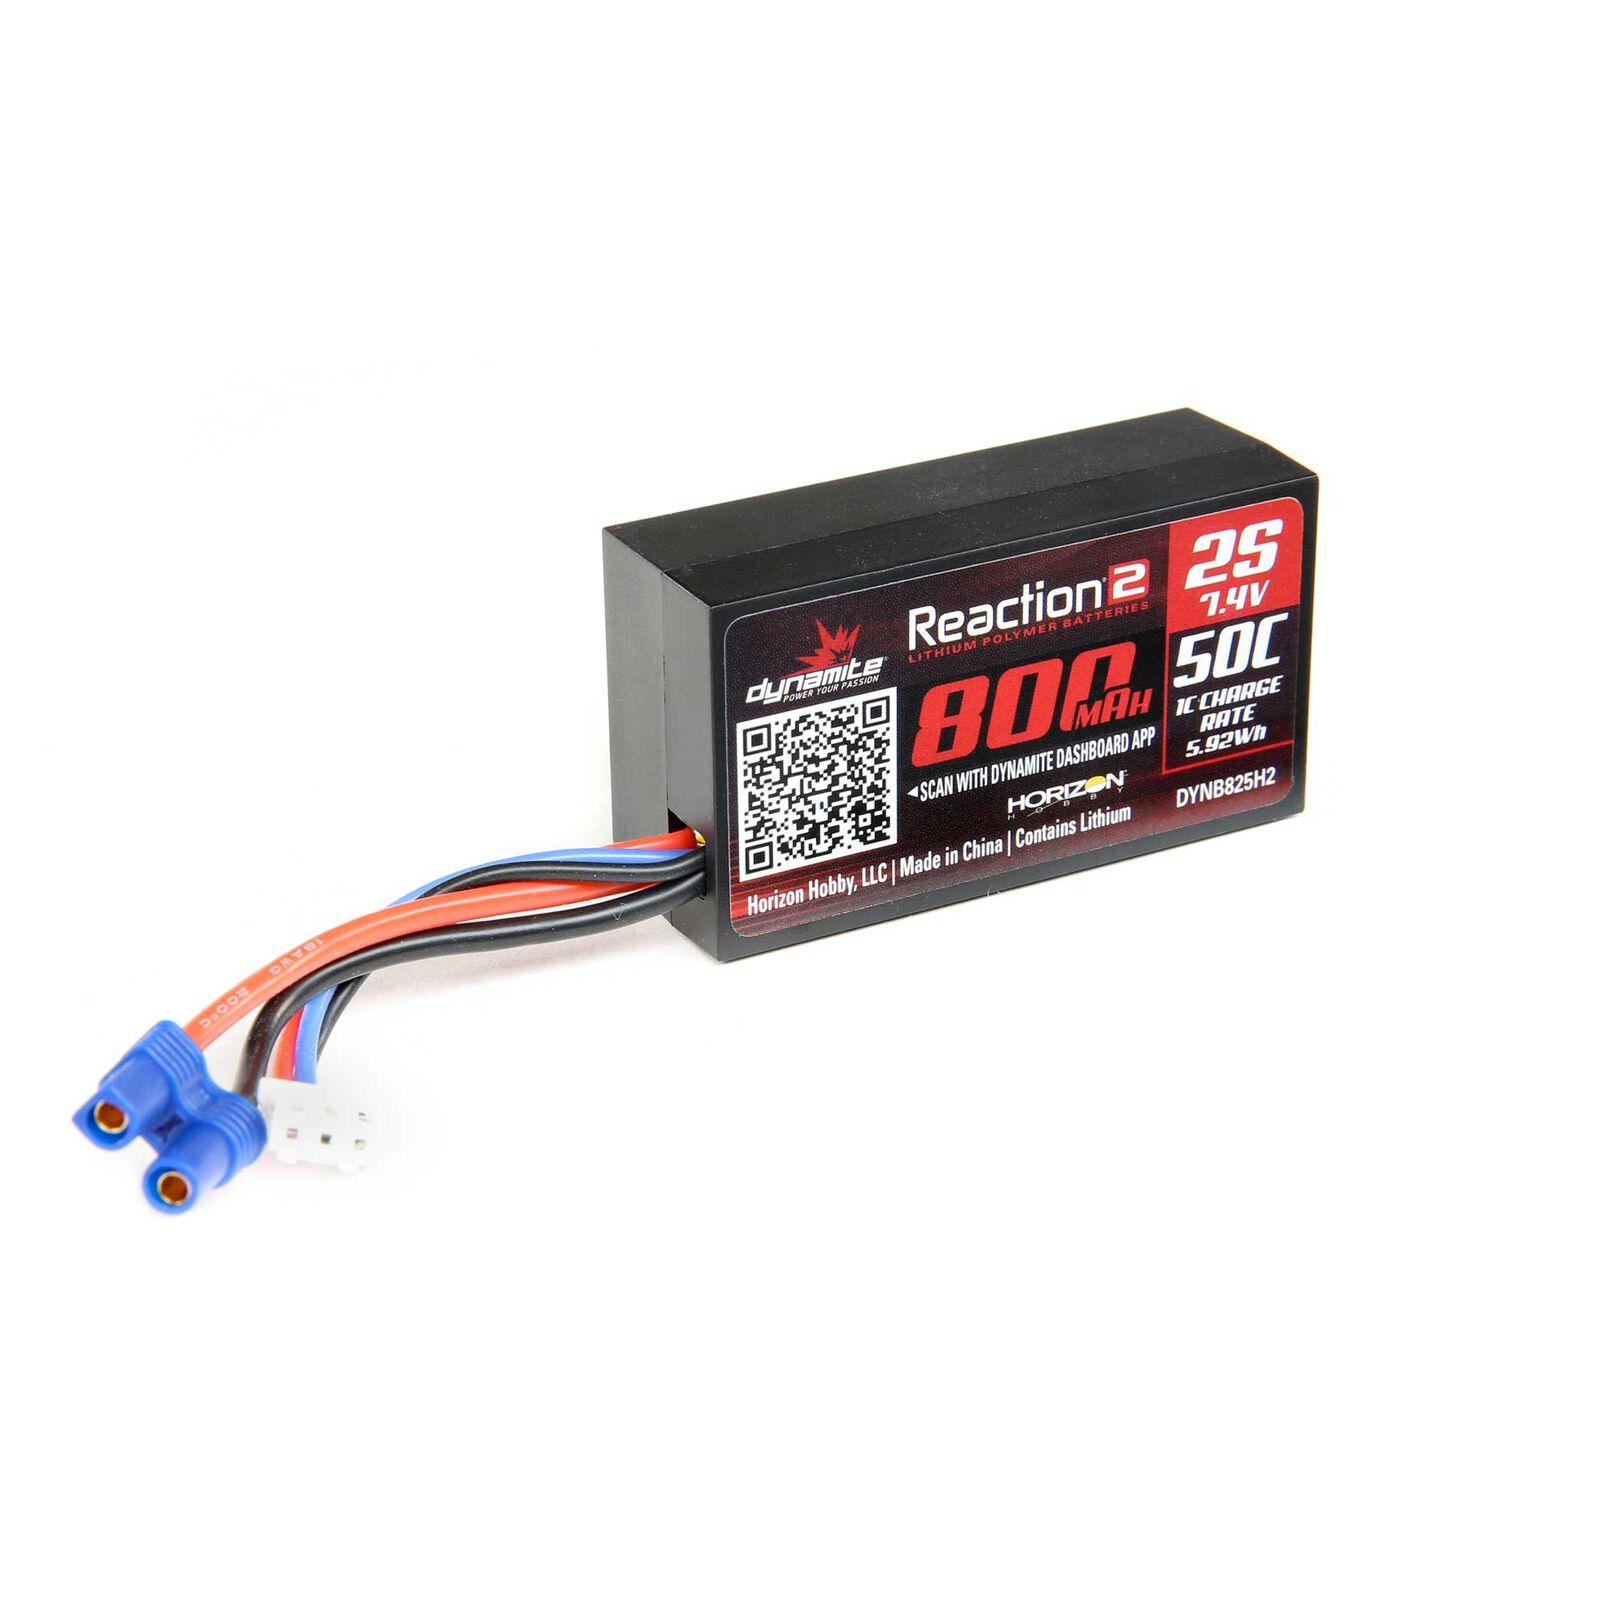 7.4V 800mAh 2S 50C Hardcase LiPo Battery  EC2